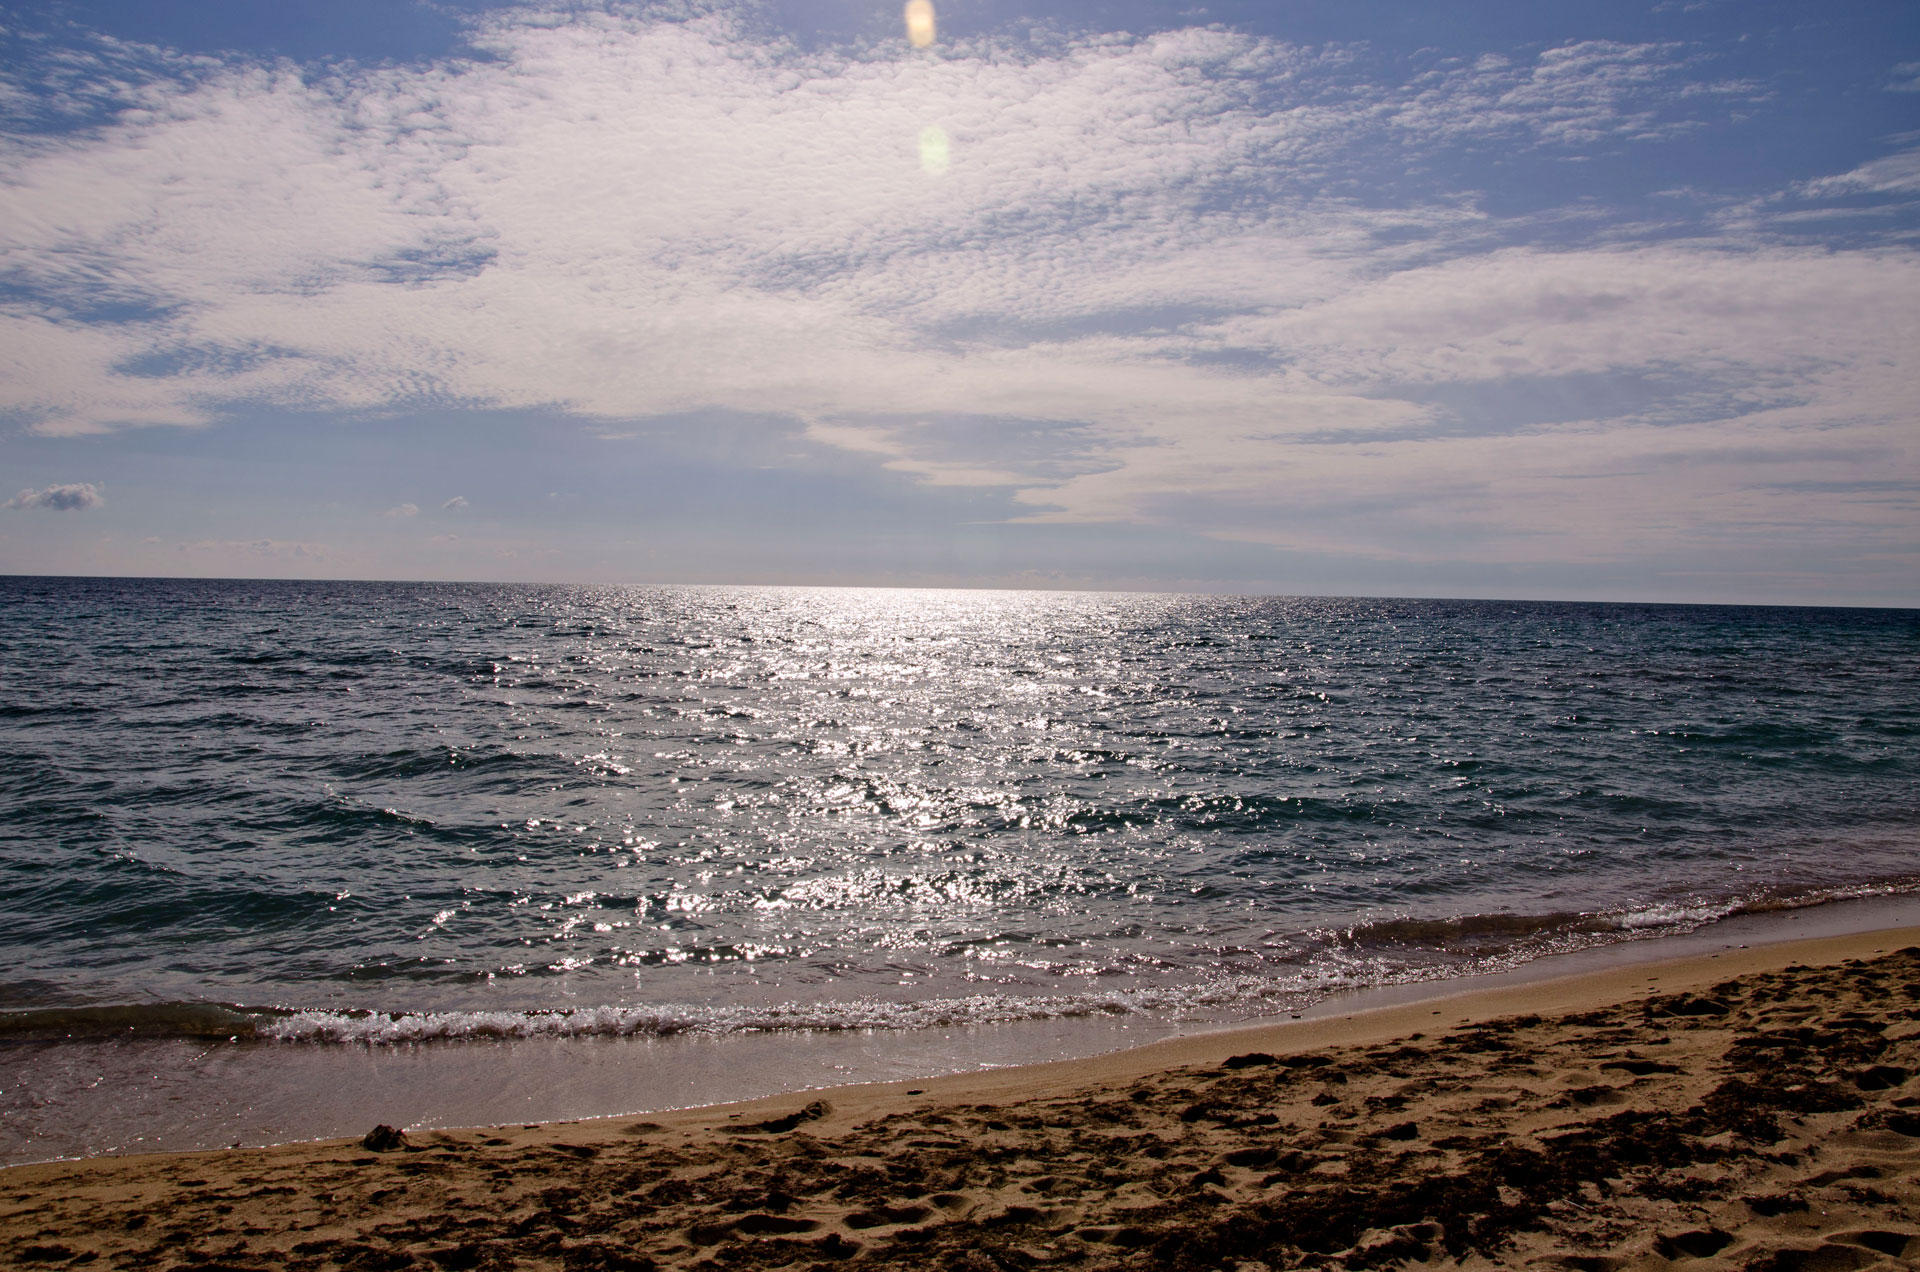 Пляж напротив РТ-70. Фото Витино